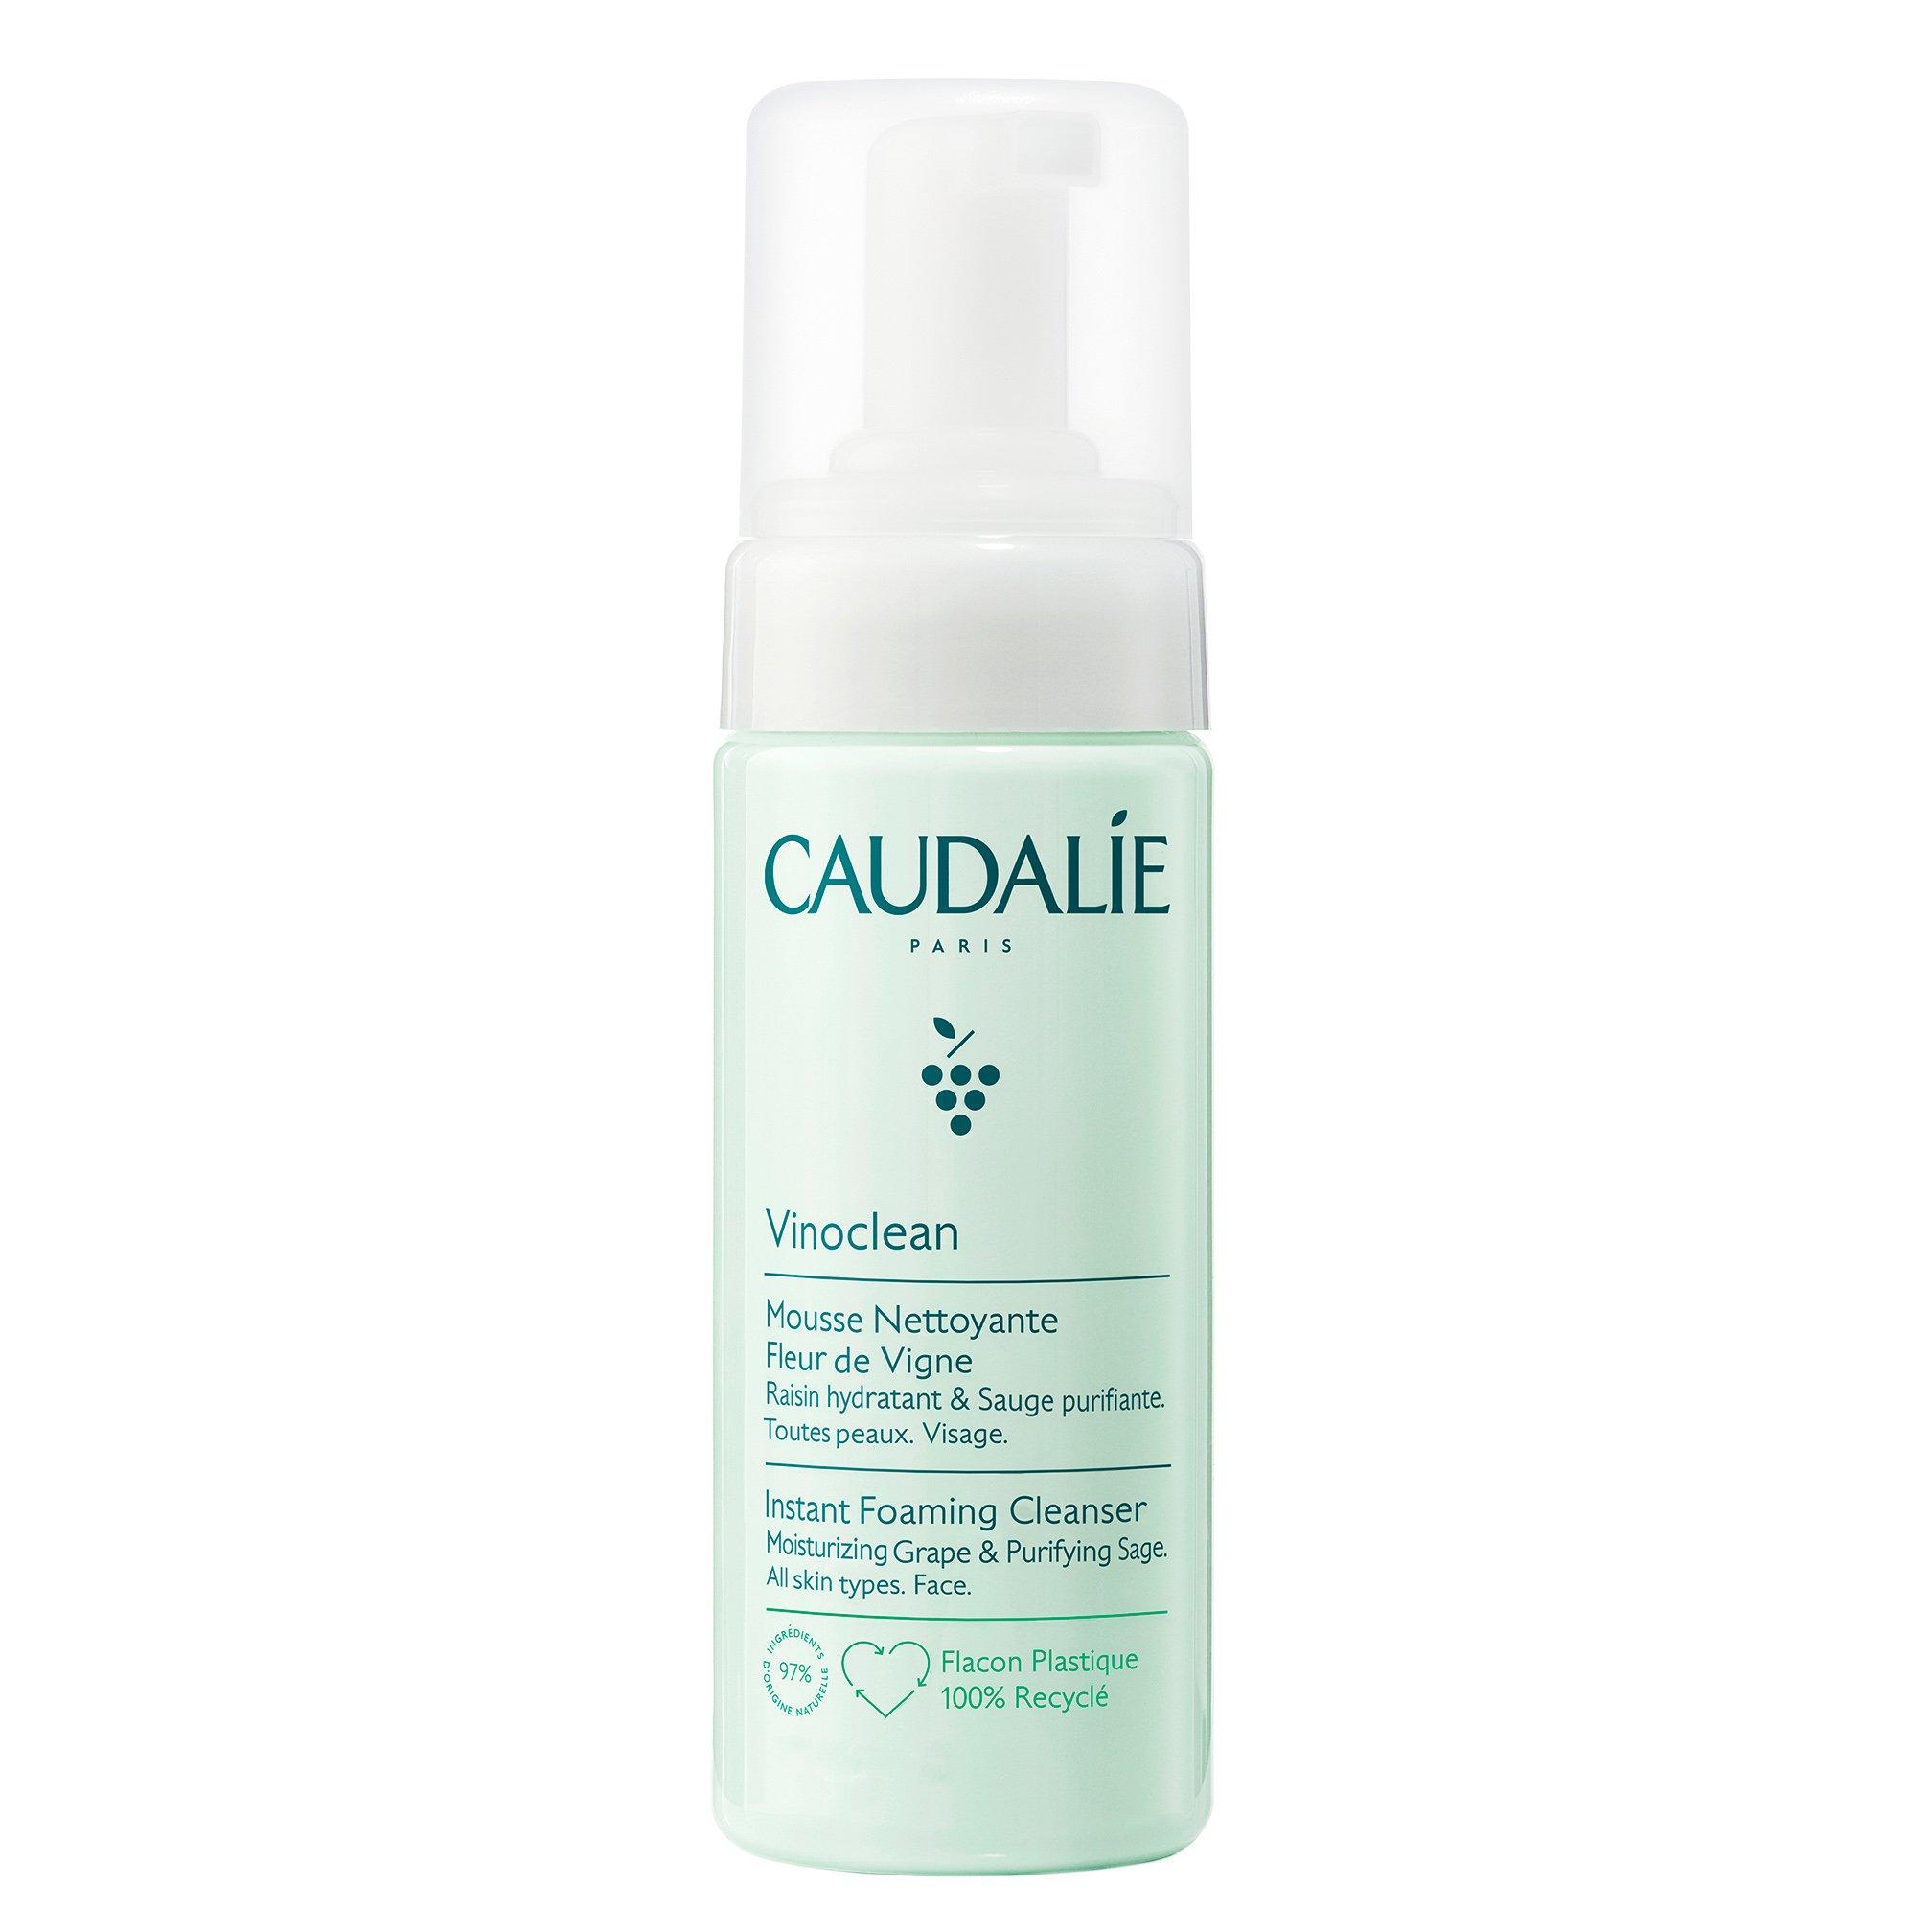 Caudalie Vinoclean Instant Foaming Cleanser Εξυγιαντικός Αφρός Καθαρισμού Προσώπου για Όλους τους Τύπους Επιδερμίδας 50ml